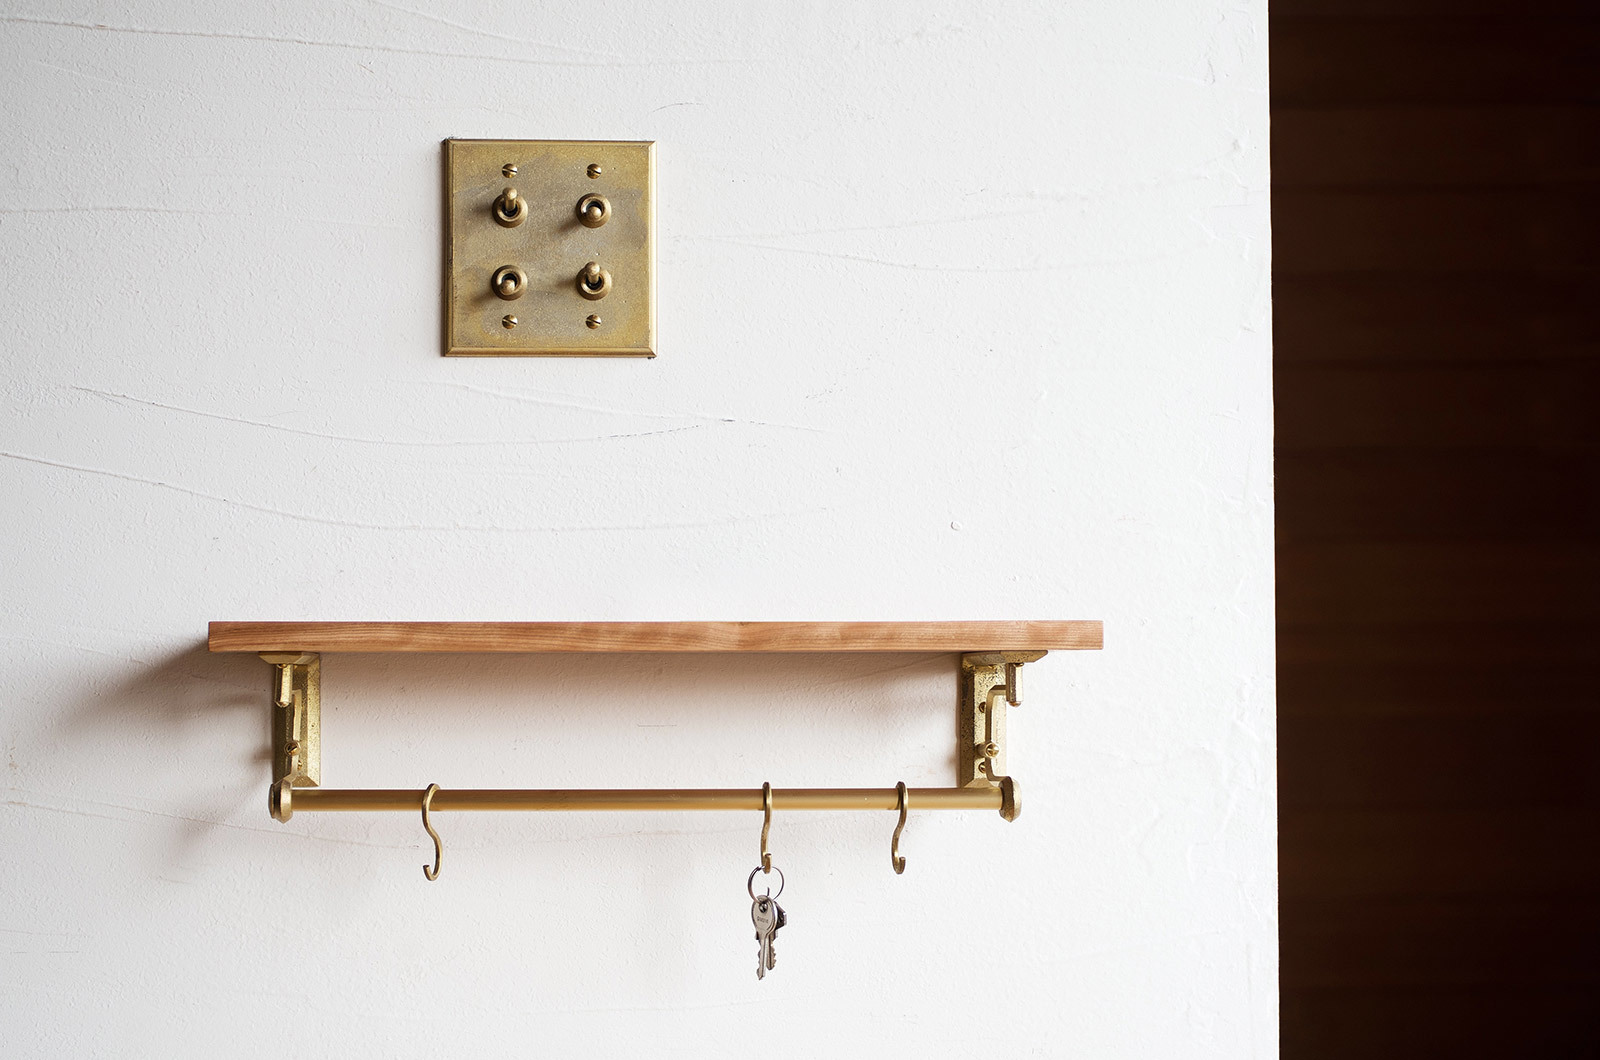 large_brass-shelf-bracket-futagami-nalata-nalata